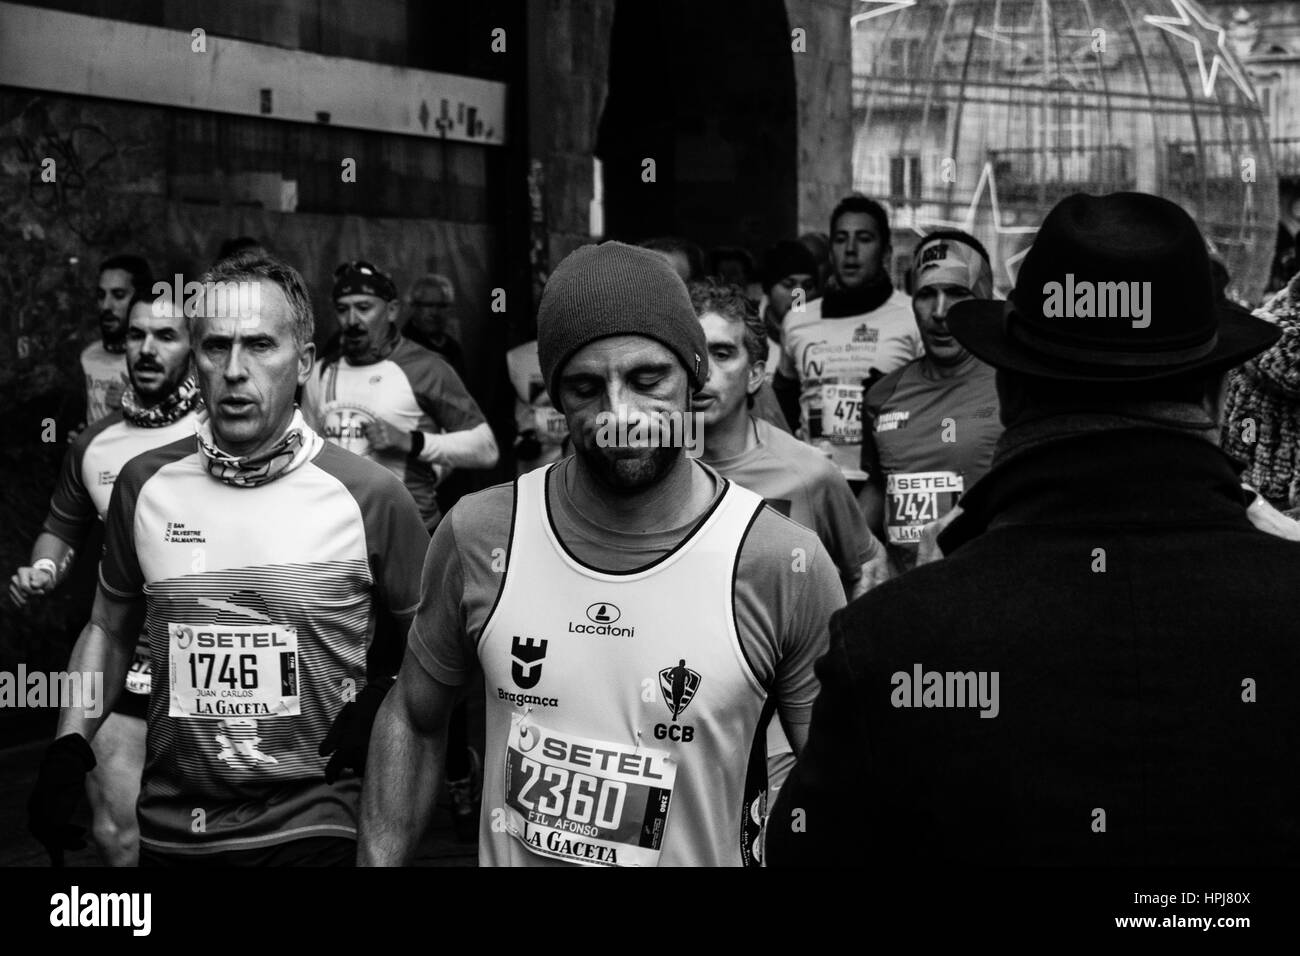 Marathon Running Black and White Stock Photos & Images